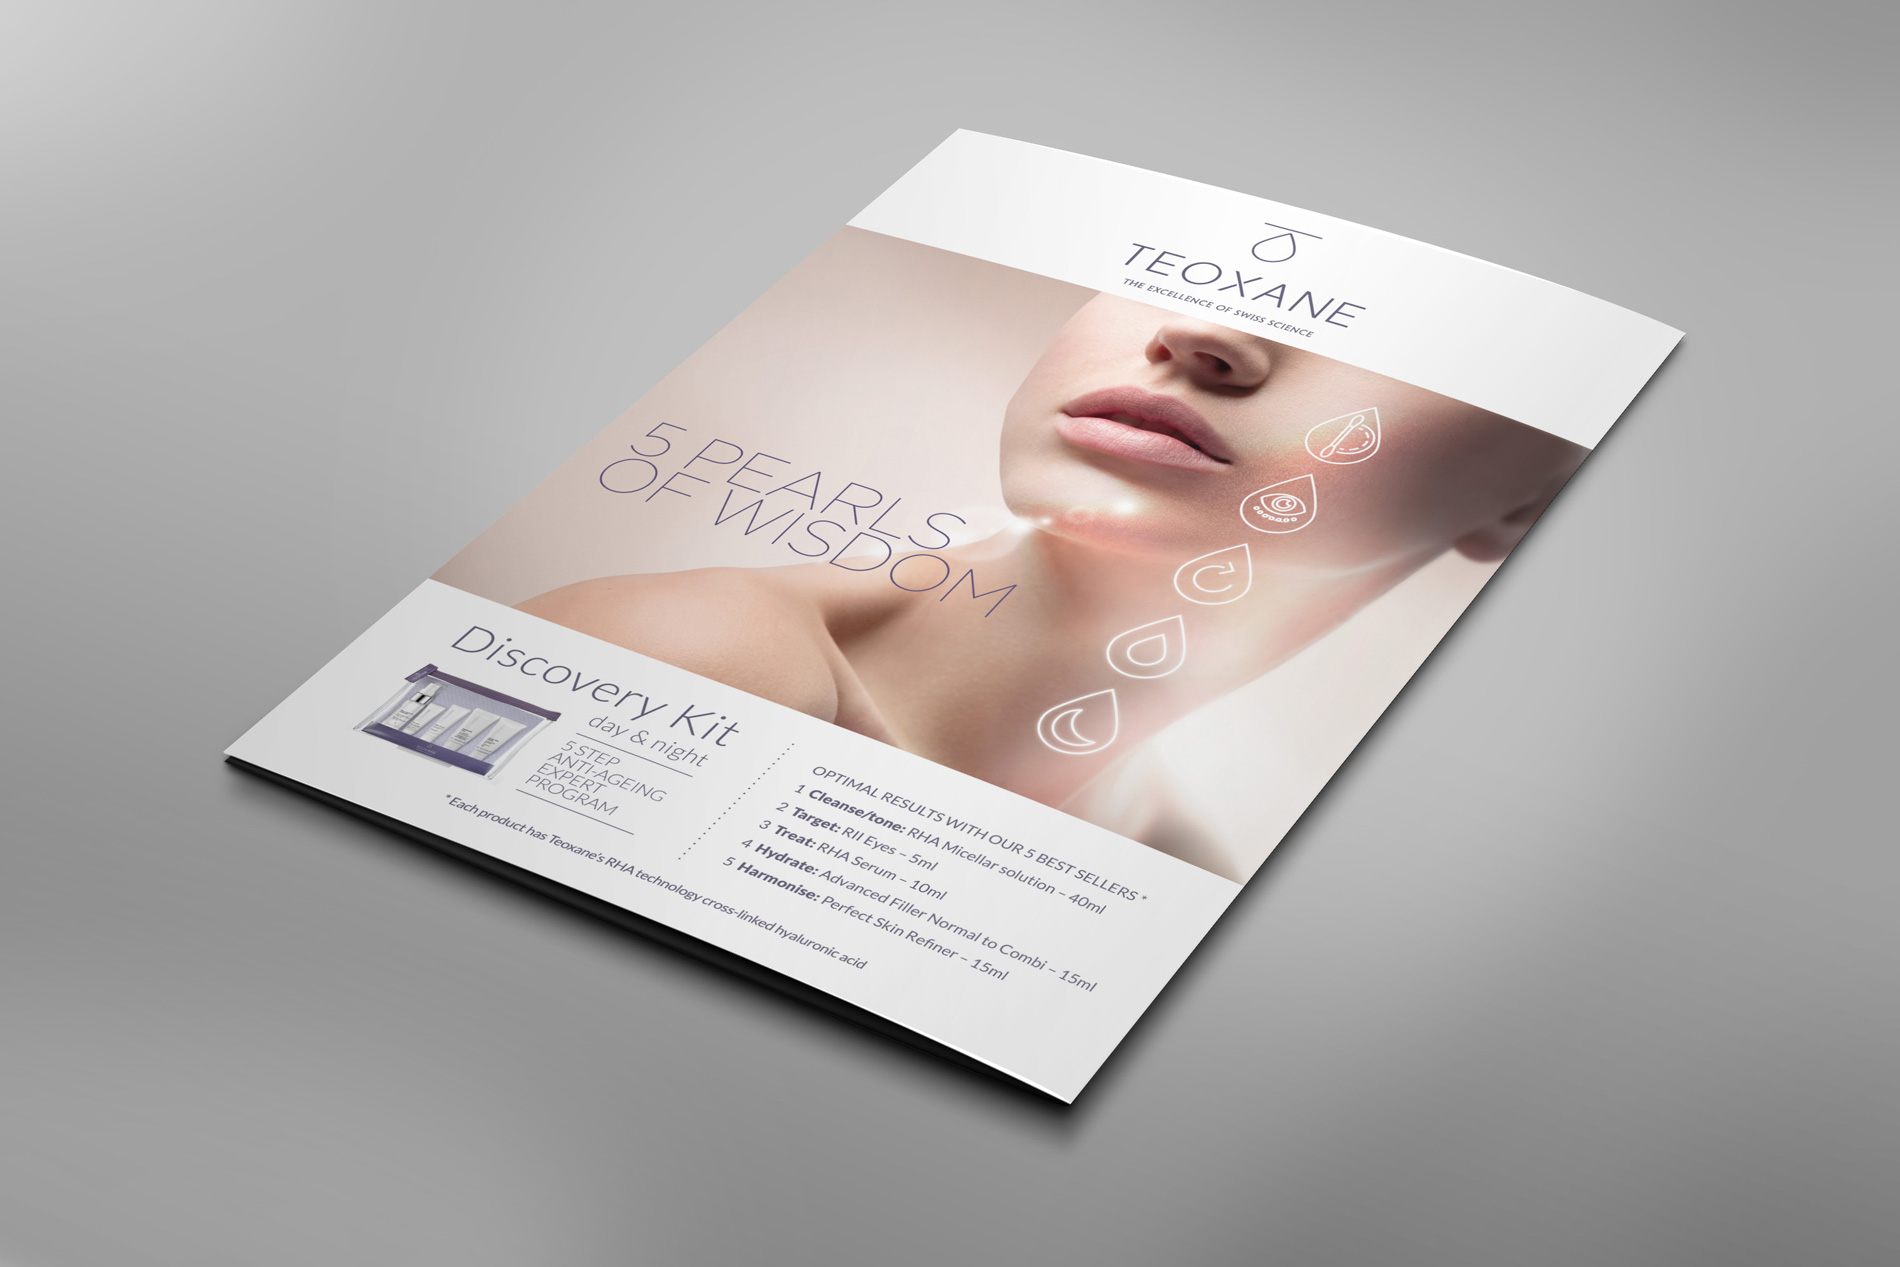 teoxane-visuel-campagne-agence-communication-medical-karma-sante-nice-paris-5